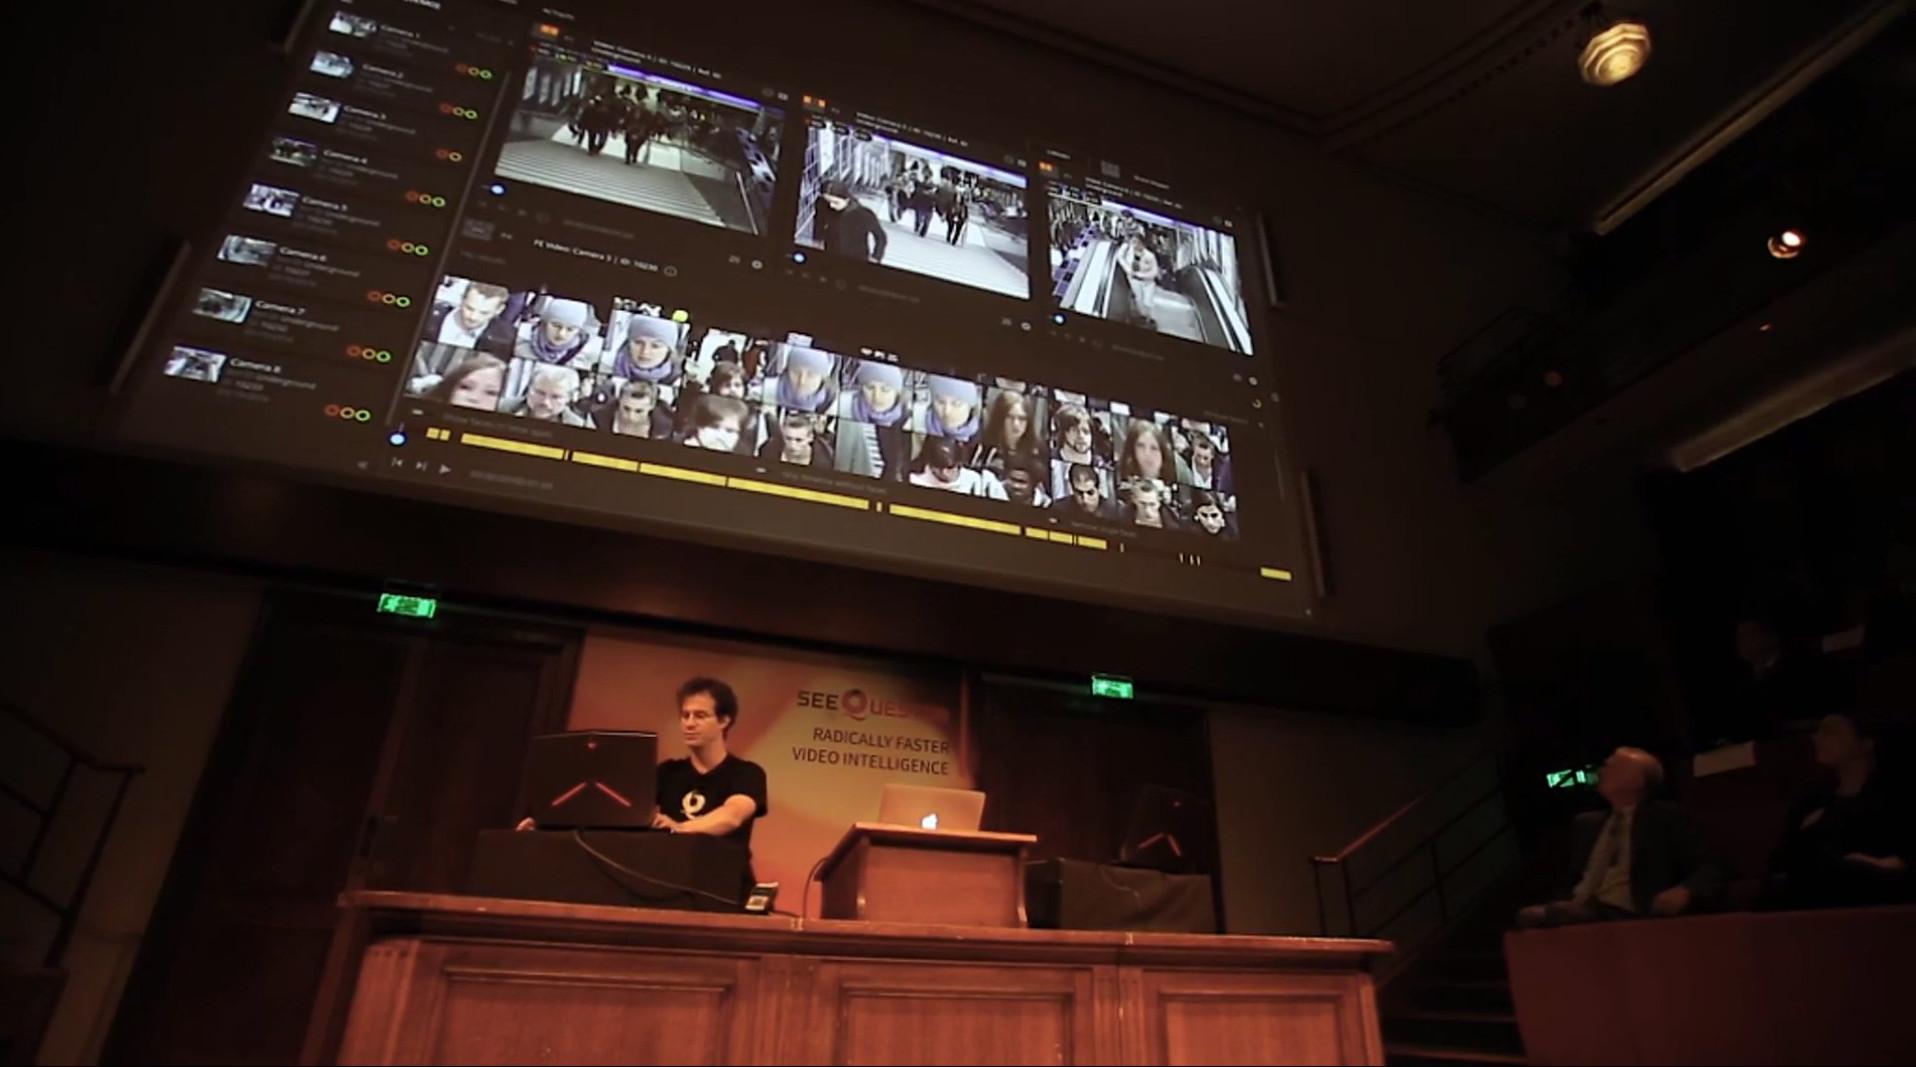 SeeQuestor demo presentation Faraday Theatre, Royal Institution (UK)